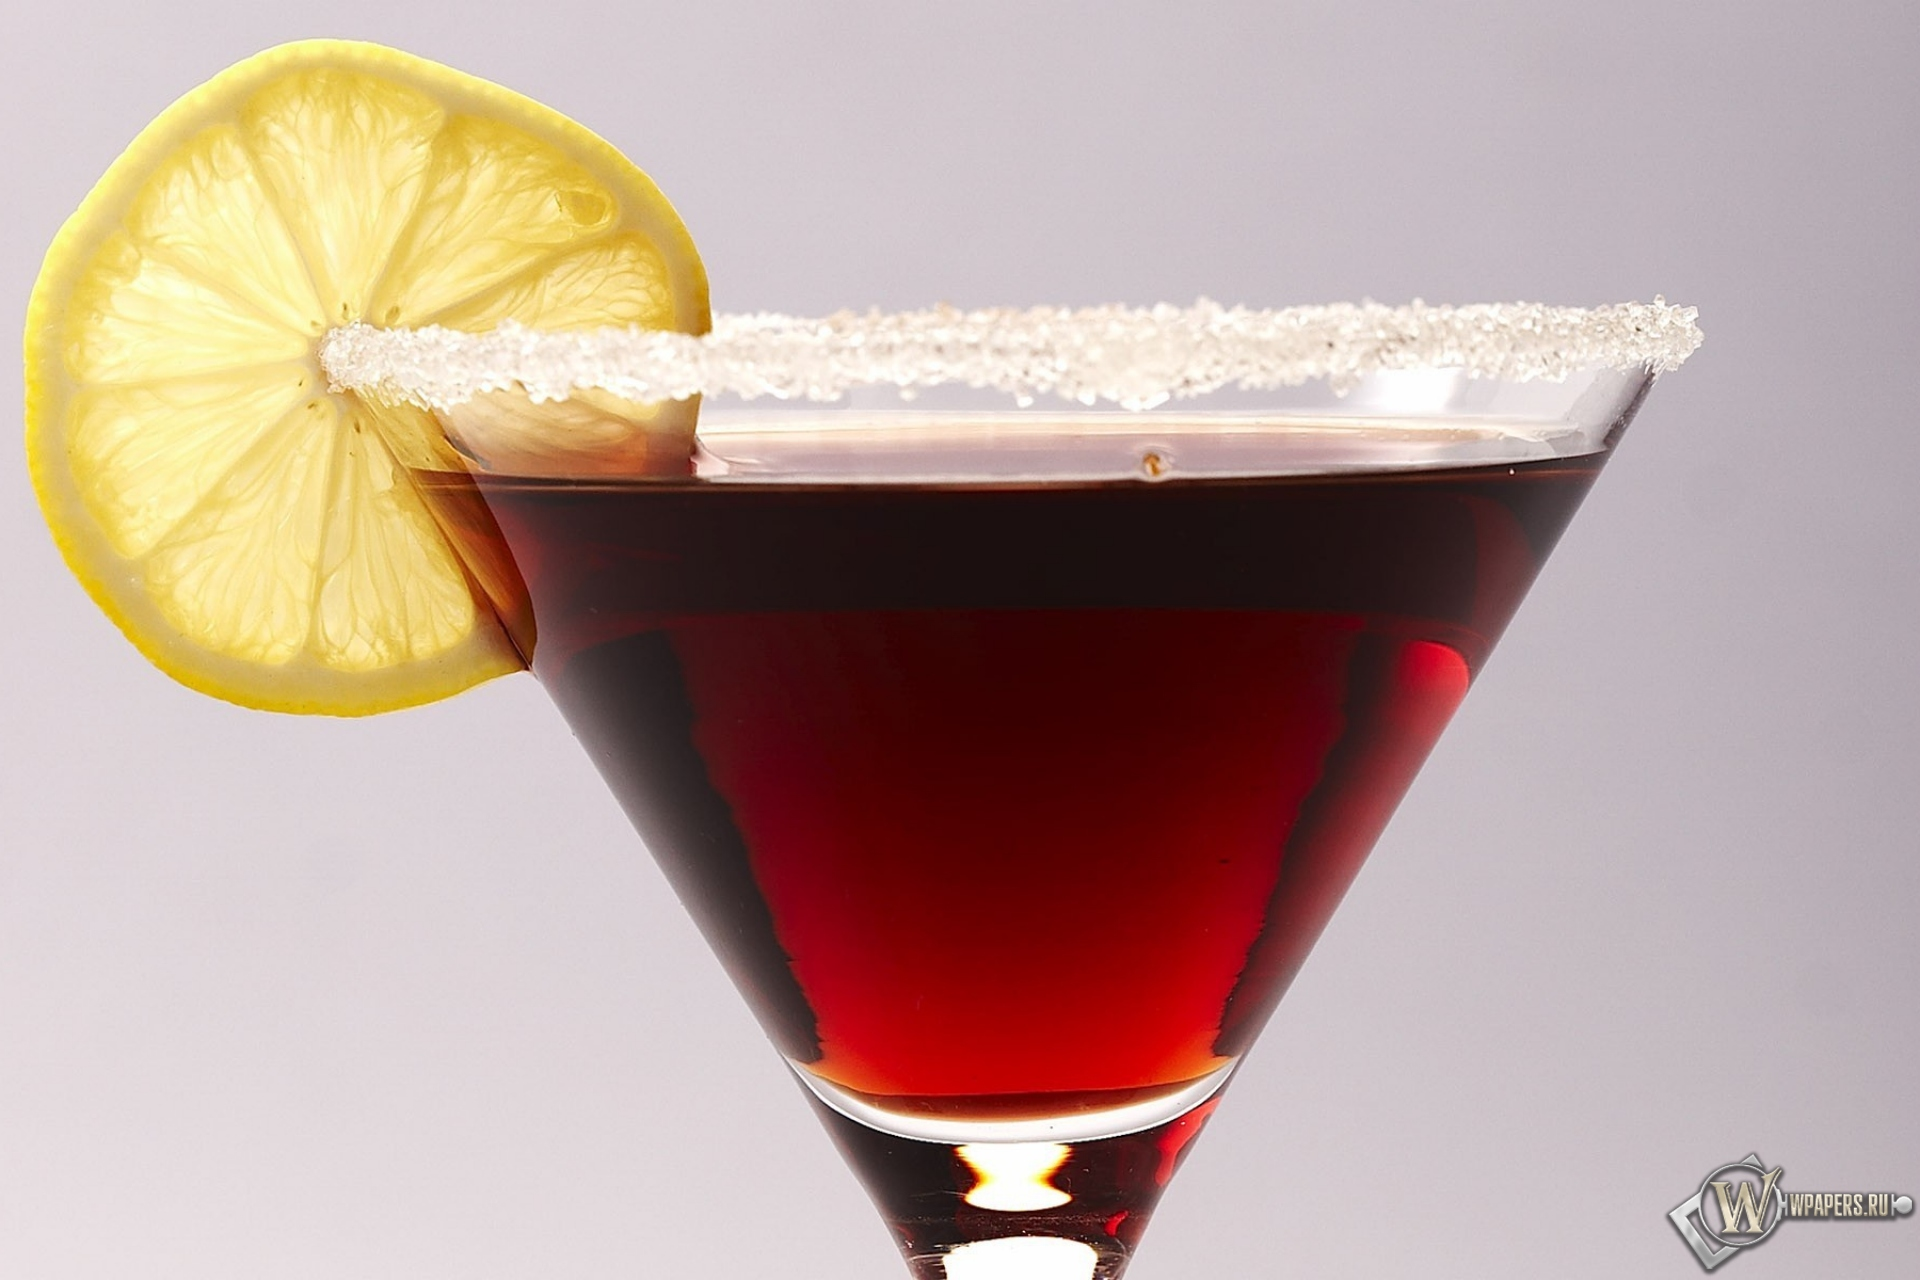 Лимон алкоголь бокал 1920x1280 картинки